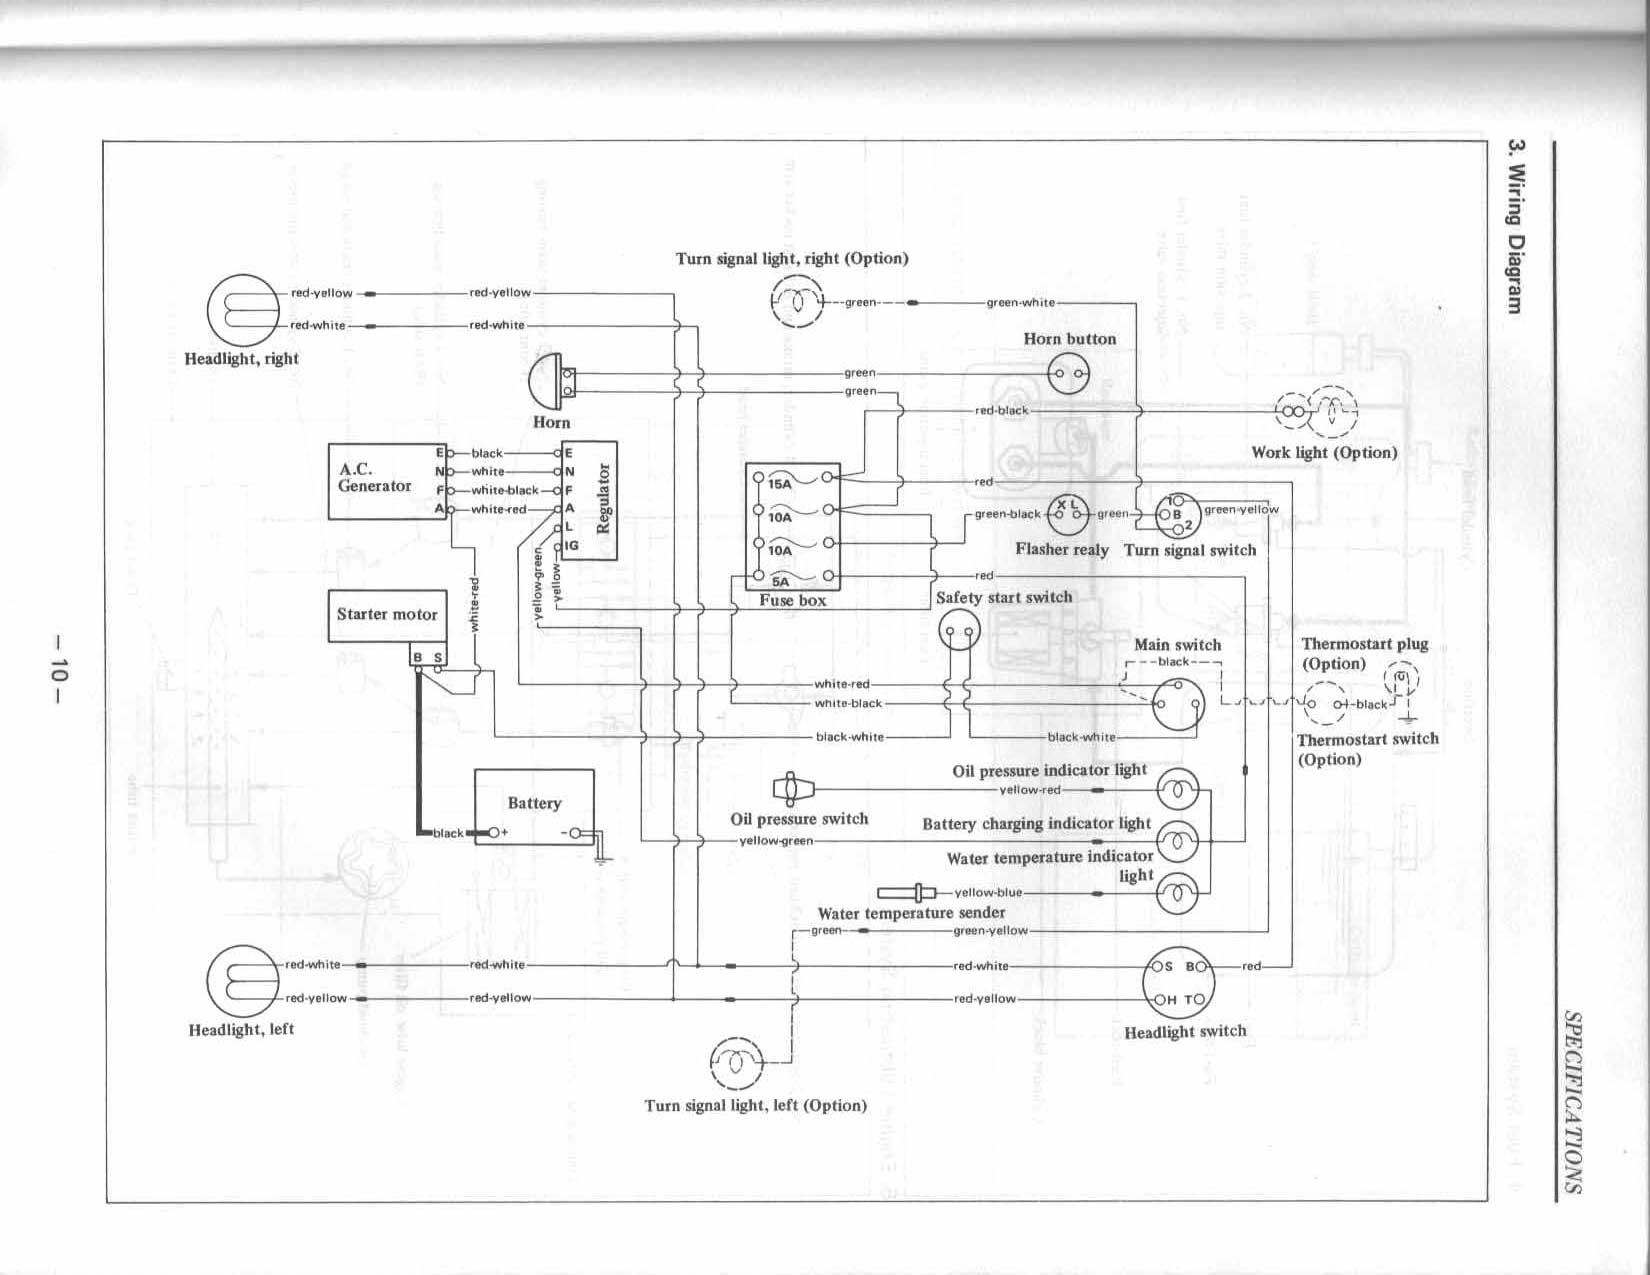 Wiring diagram for kubota zd21 the wiring diagram readingrat kubota g4200 wiring diagram kubota discover your wiring diagram wiring diagram swarovskicordoba Gallery